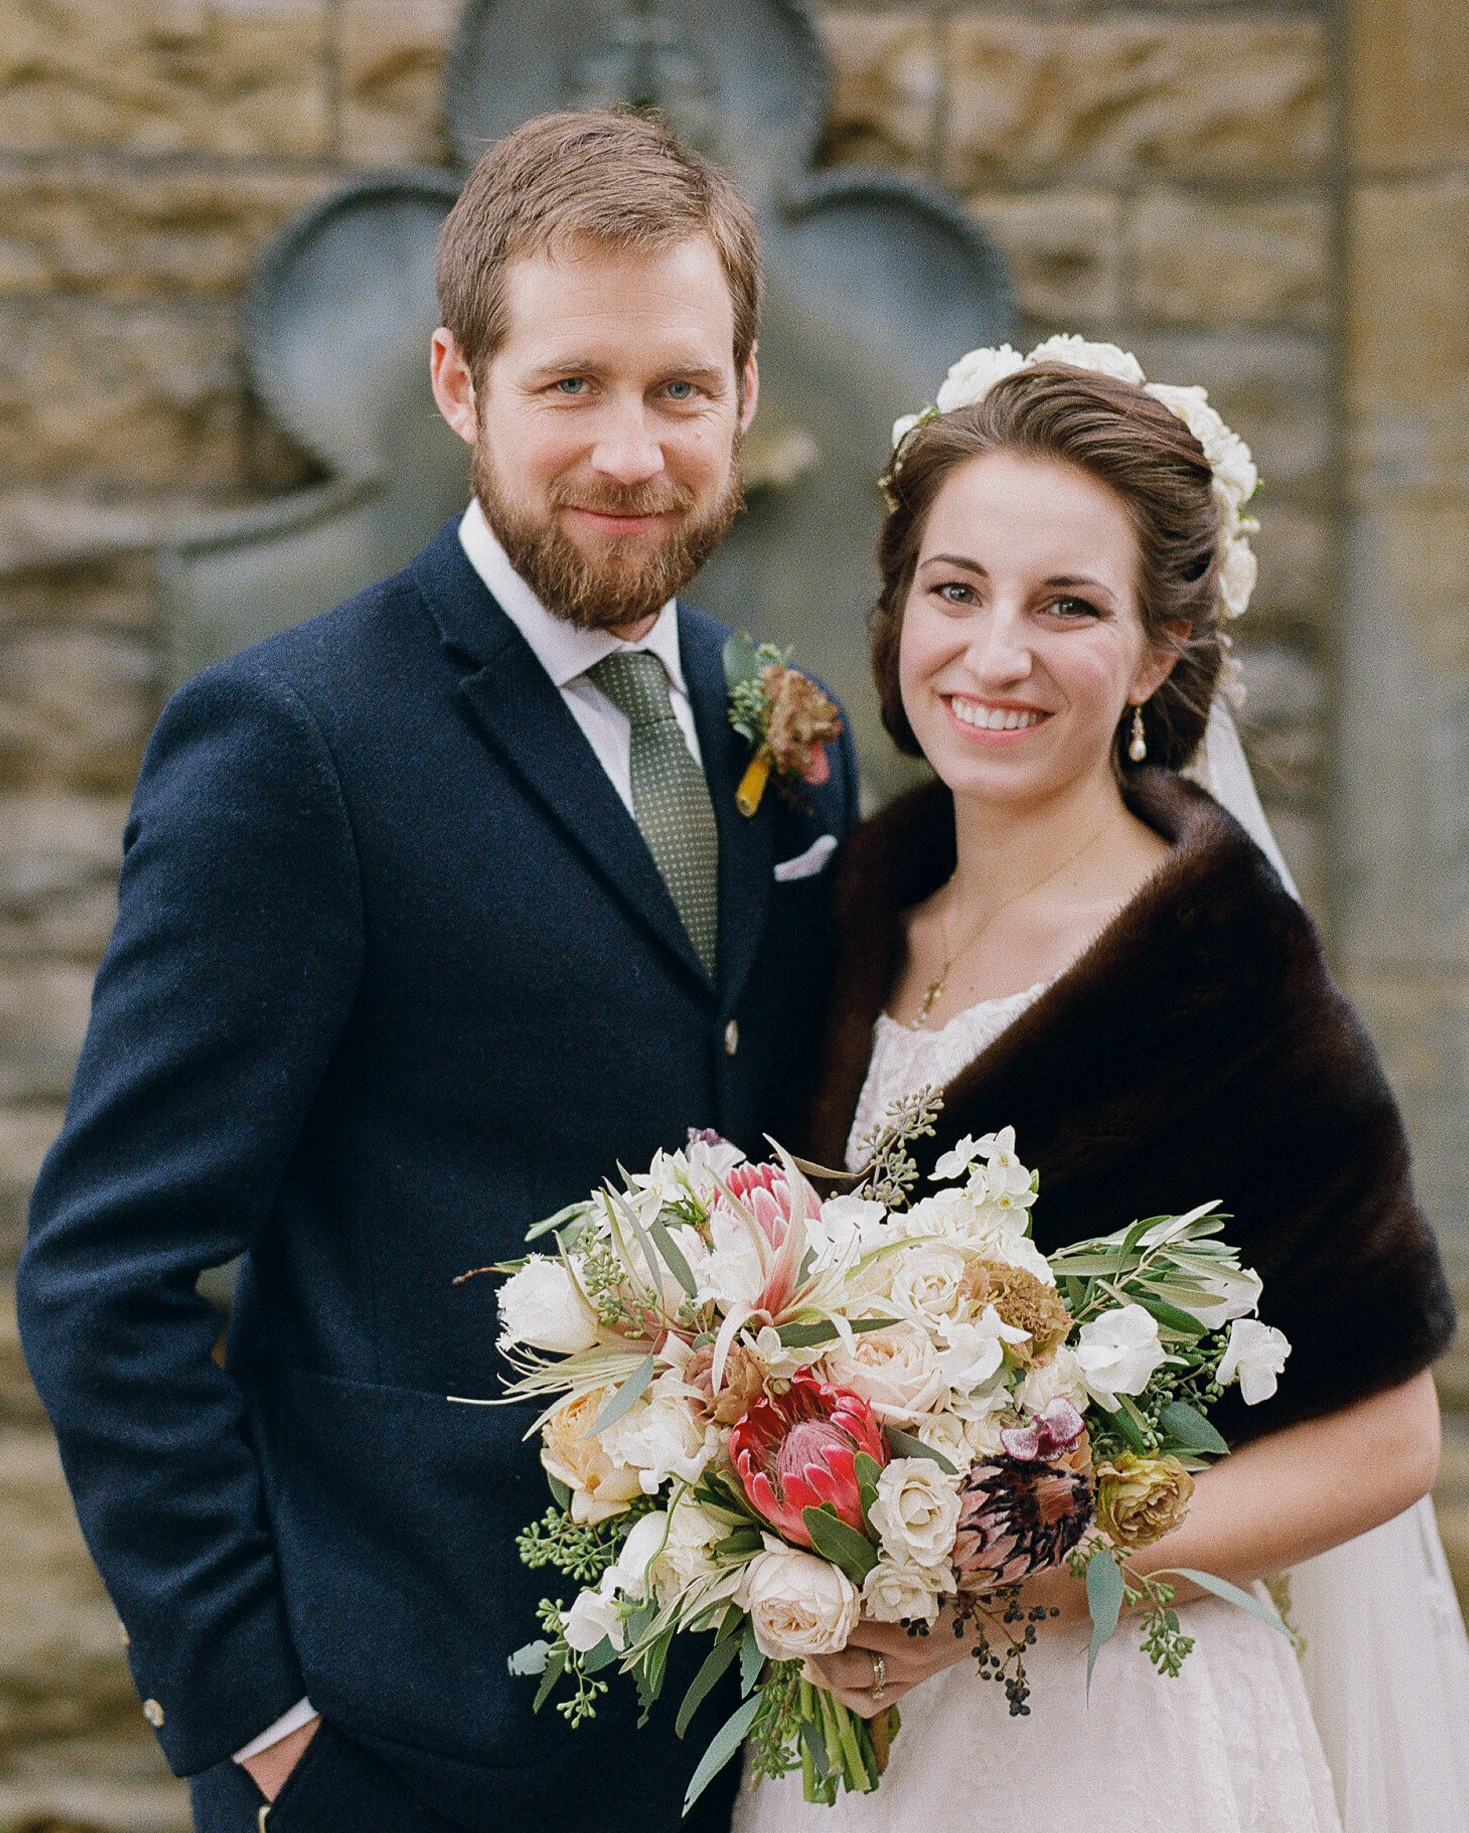 sidney-dane-wedding-couple-151-s112109-0815.jpg